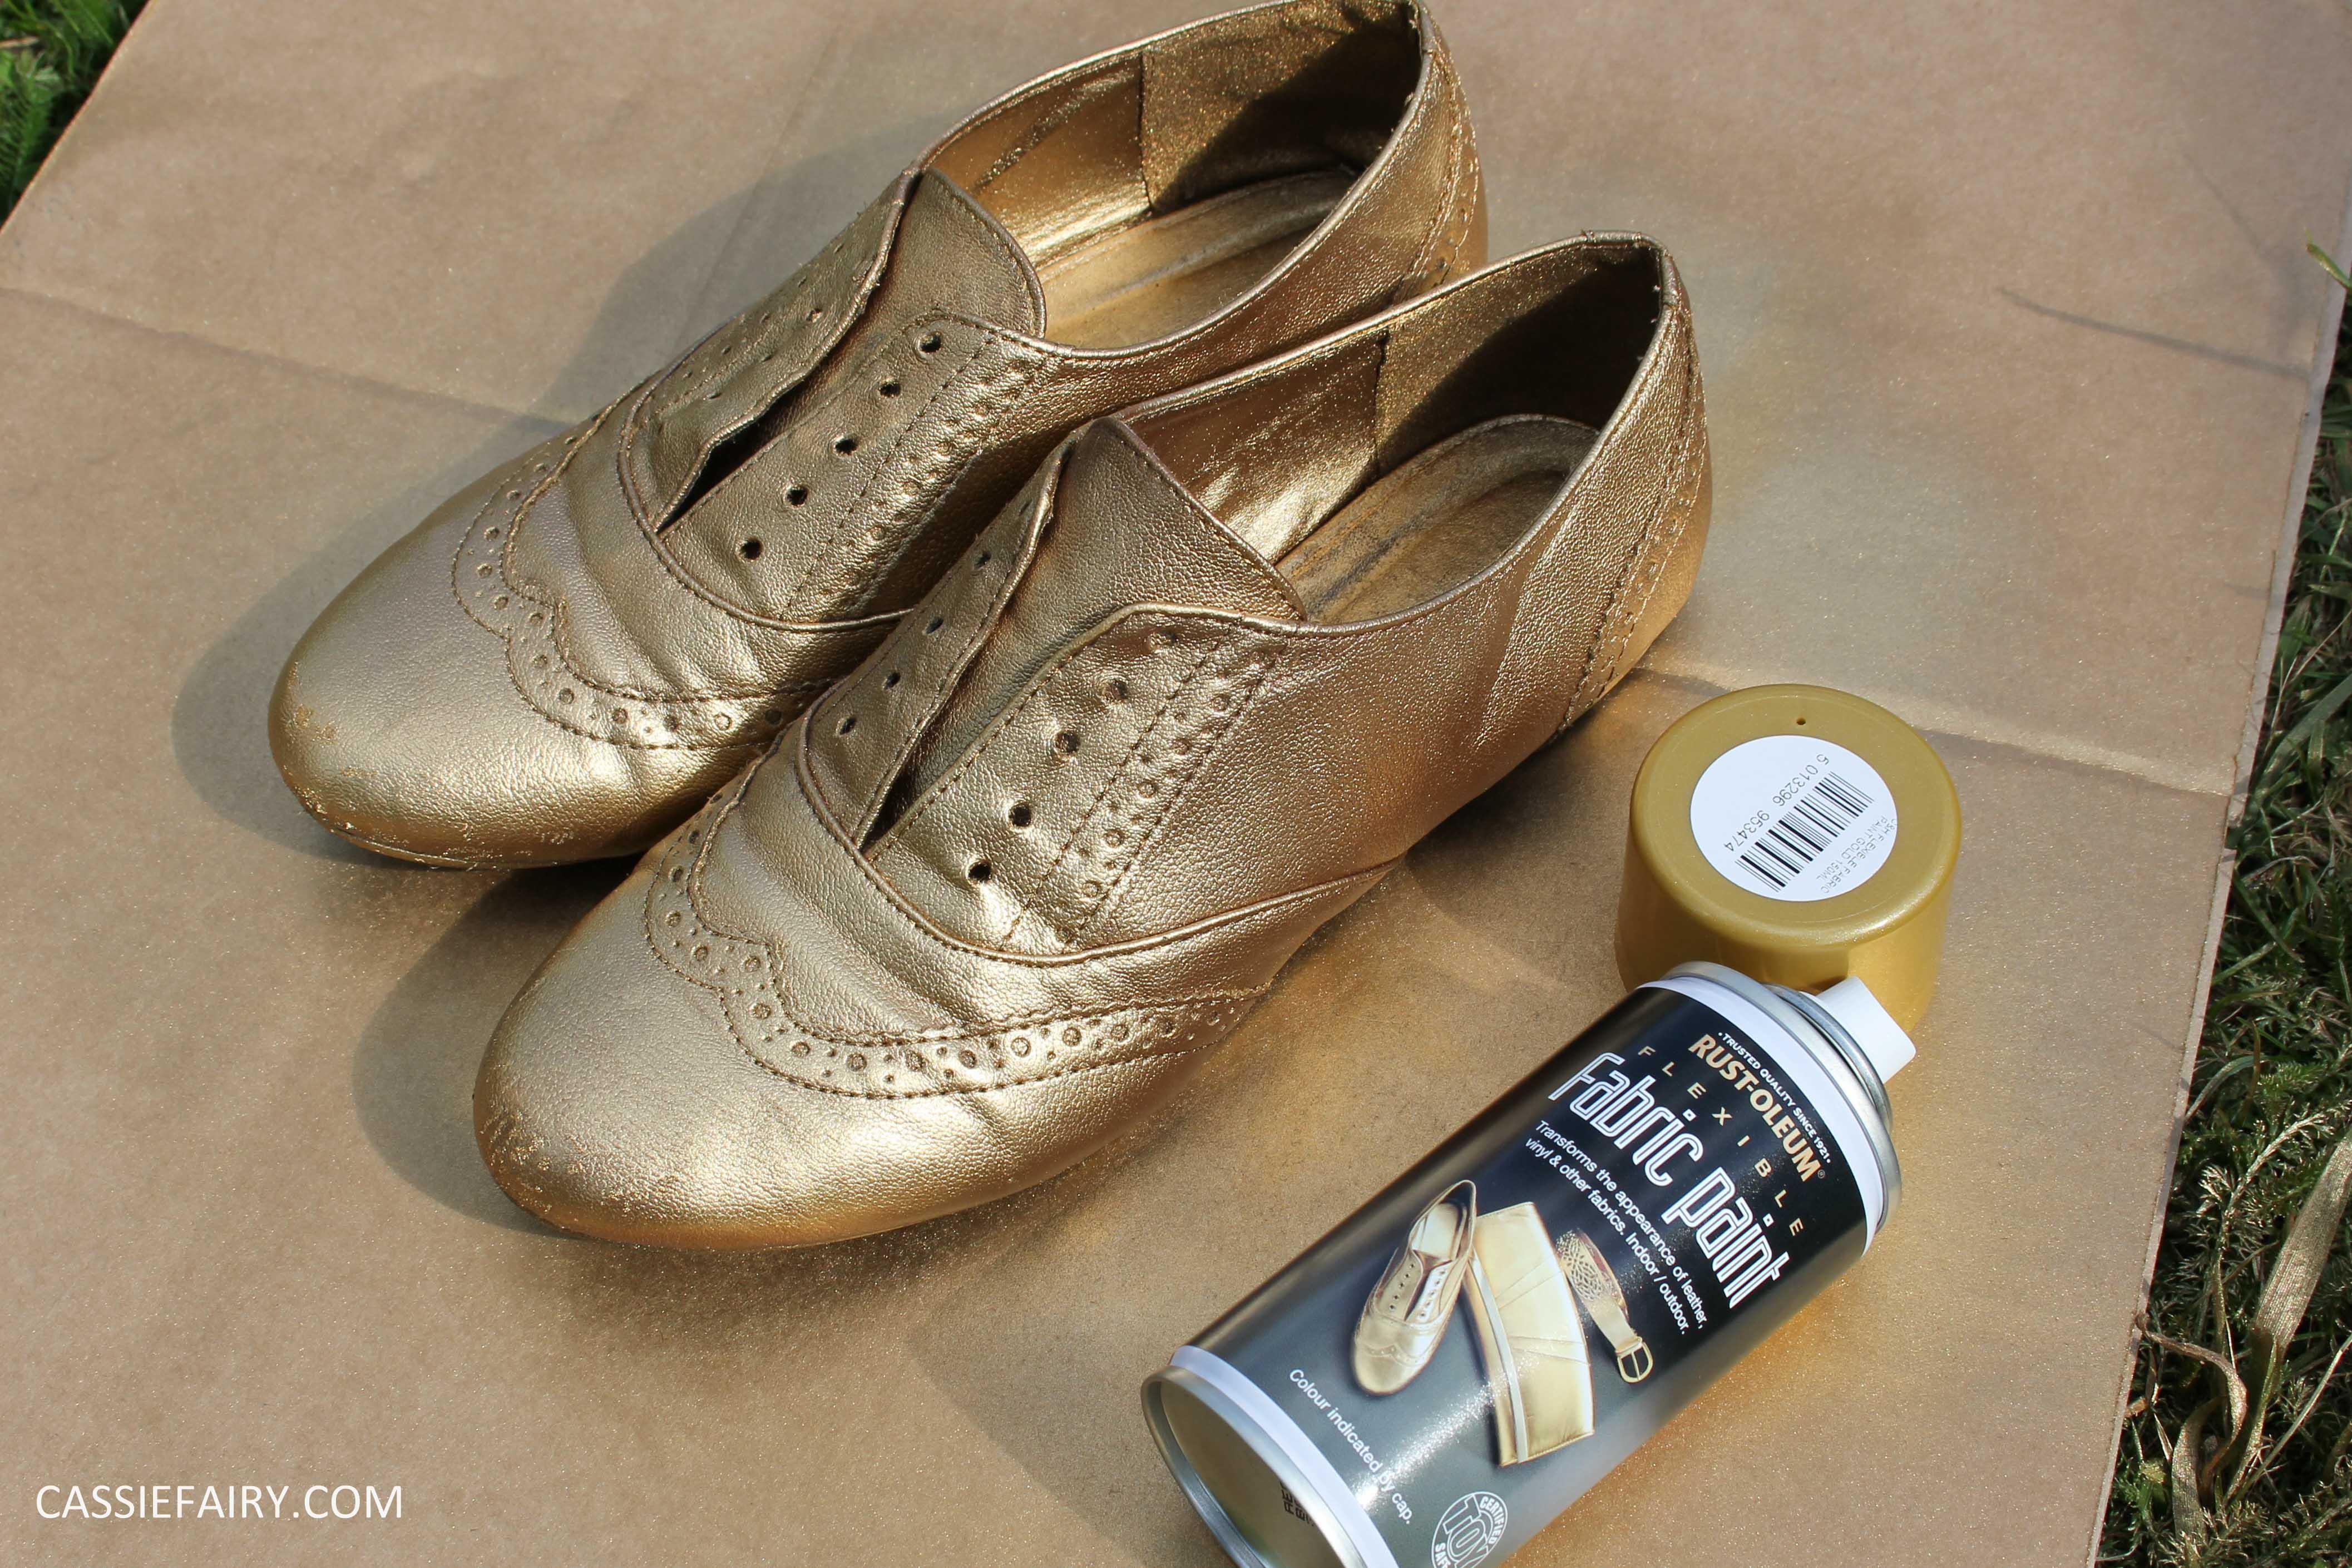 DIY shoe makeover using spray paint